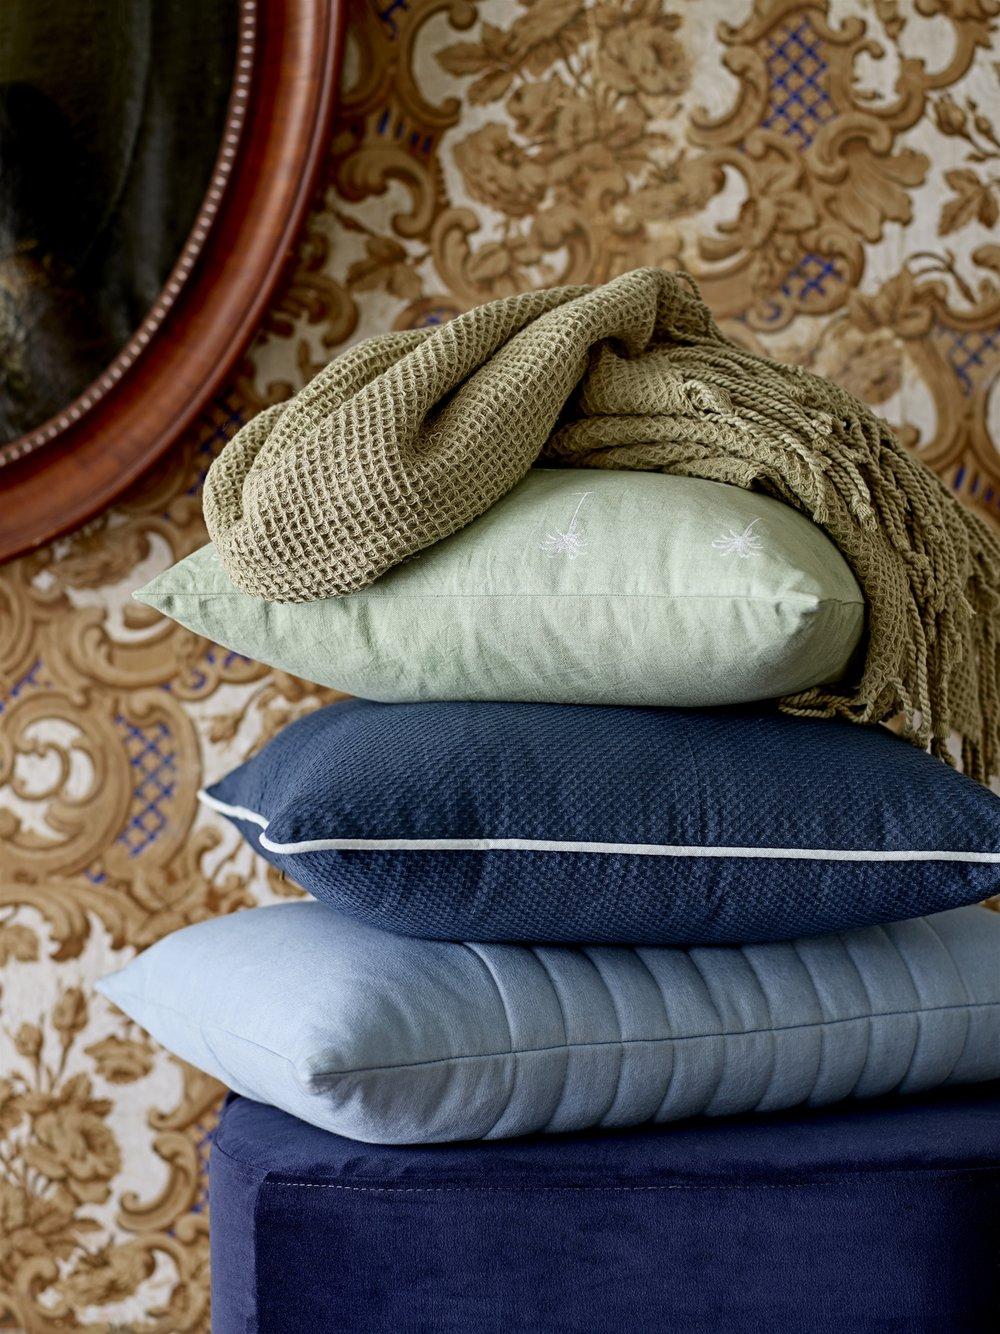 Cushion, Blue, Cotton Lifestyle.jpg